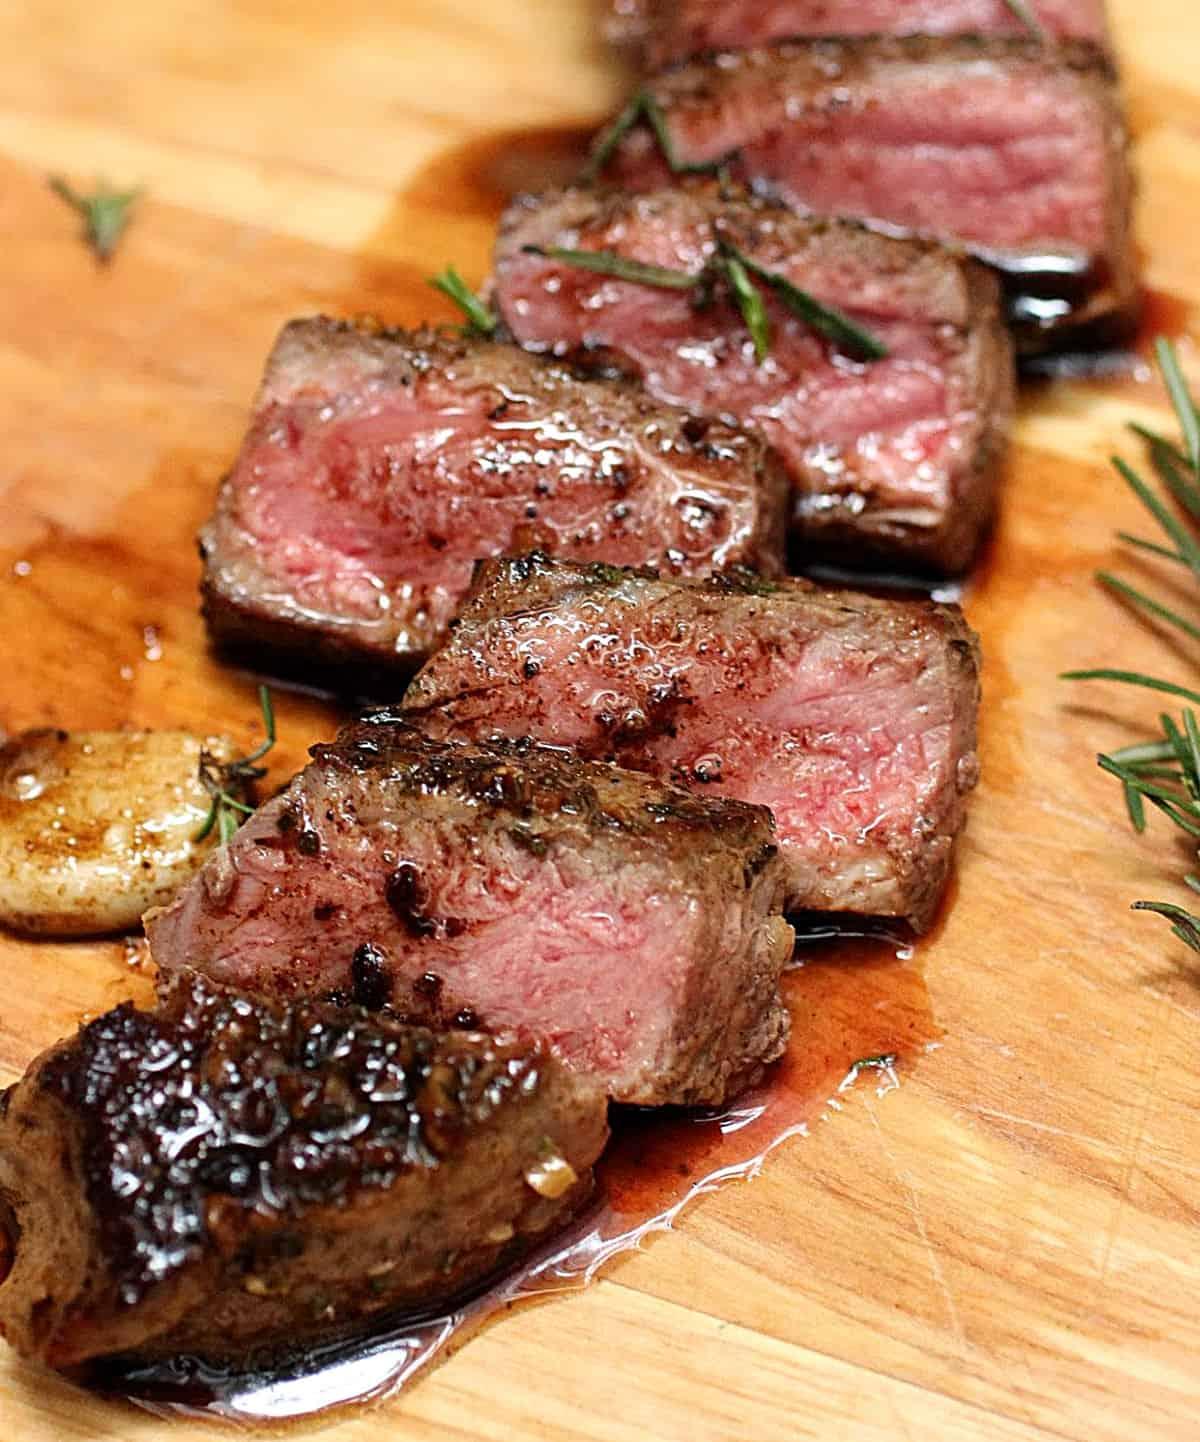 Juicy sliced rump steak on a wooden board, garlic and rosemary around